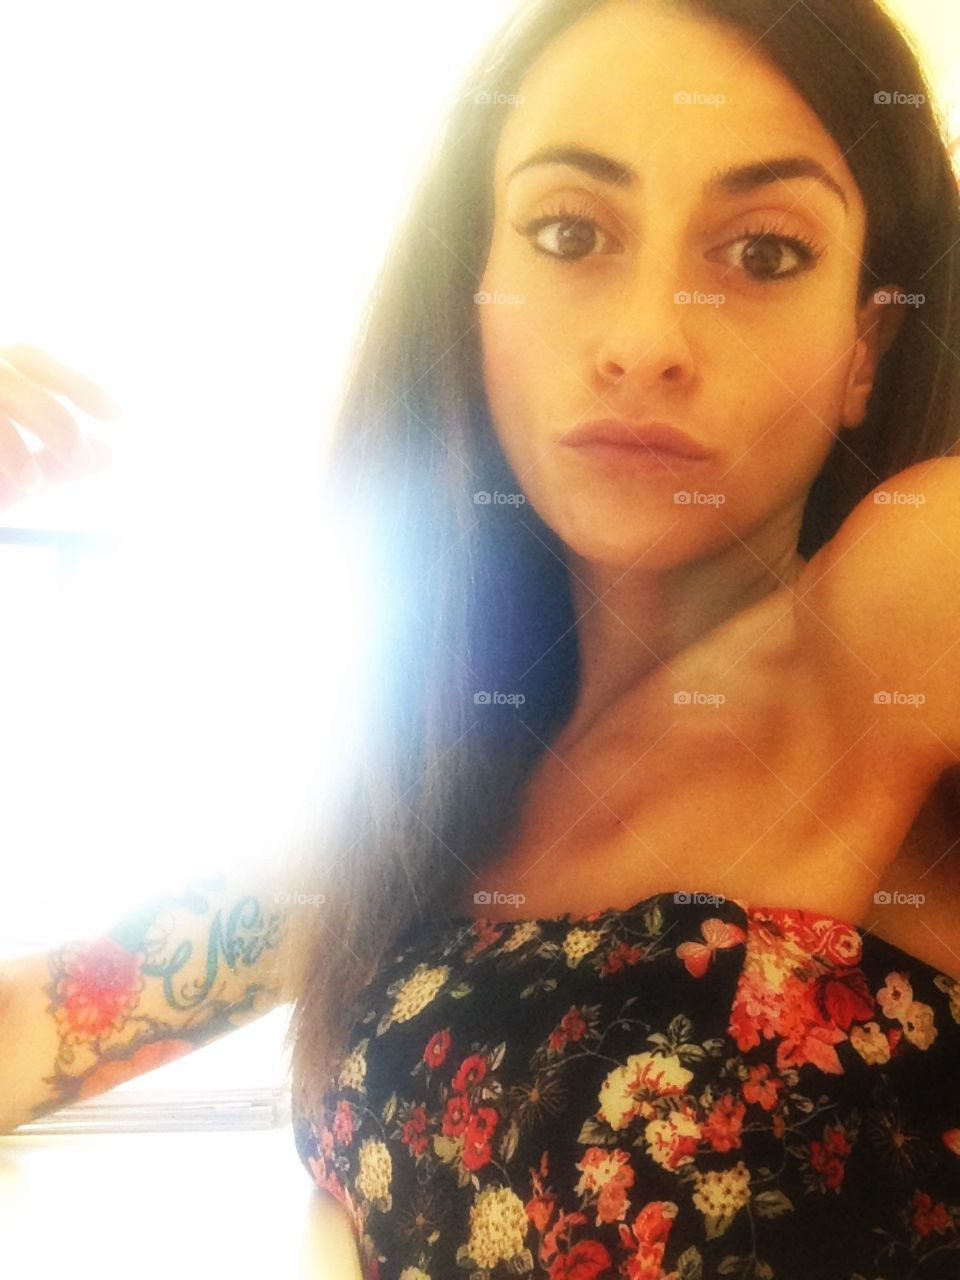 Tattoo and Woman . Nice Tattoo on a beautiful Woman